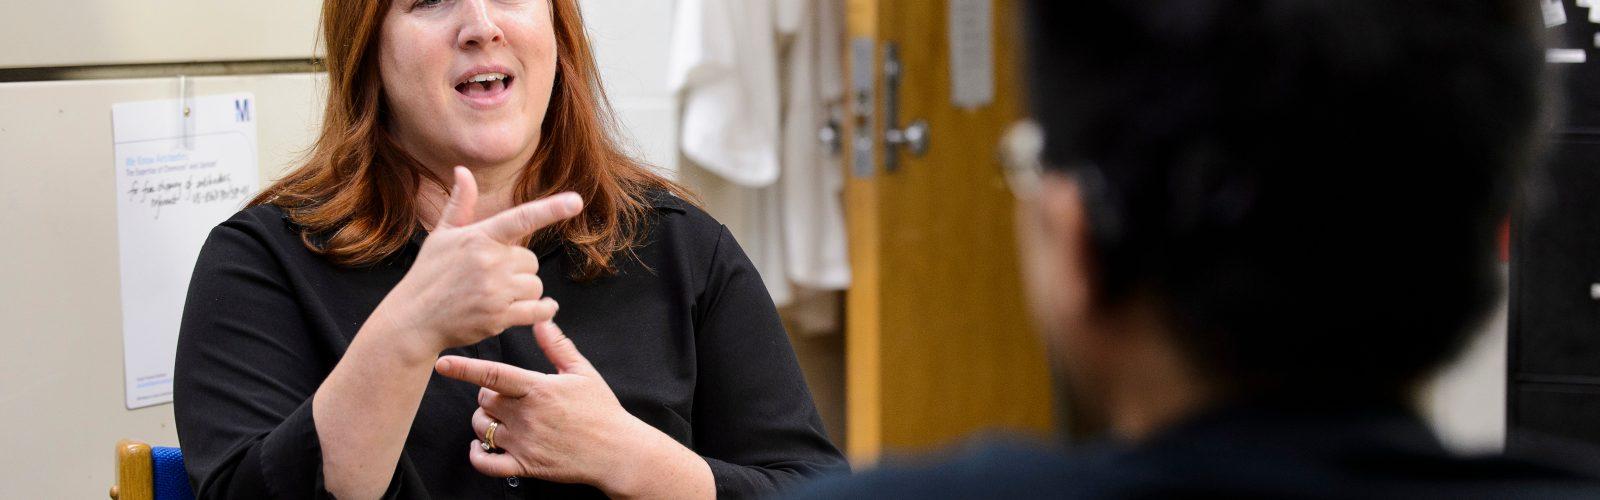 sign language interpreter signs